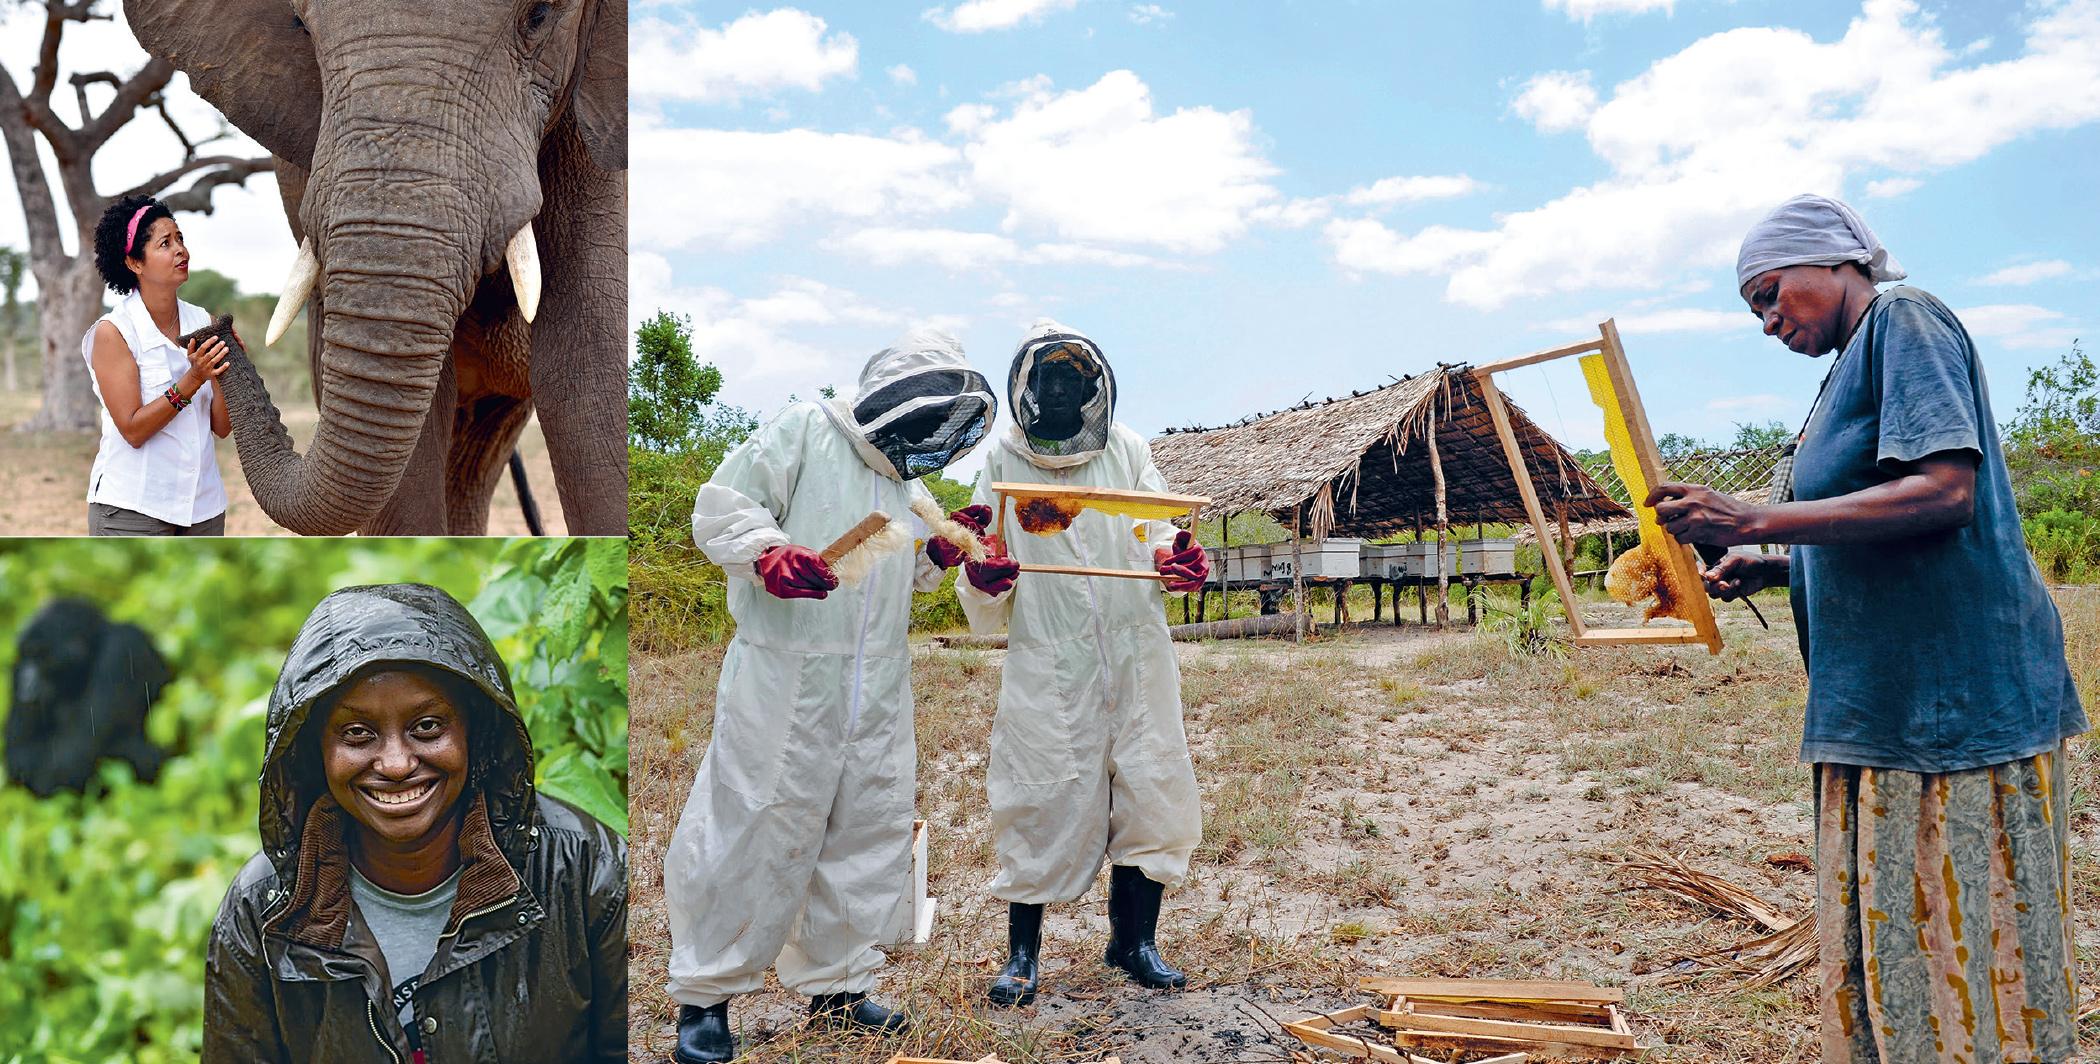 Top left: Paula Kahumbu. Bottom left: Gladys Kalema-Zikusoka. Main image: Bee keepers in Vanga, near Mombasa, Kenya. The honey contributes to local incomes and the hives act as an elephant deterrent.